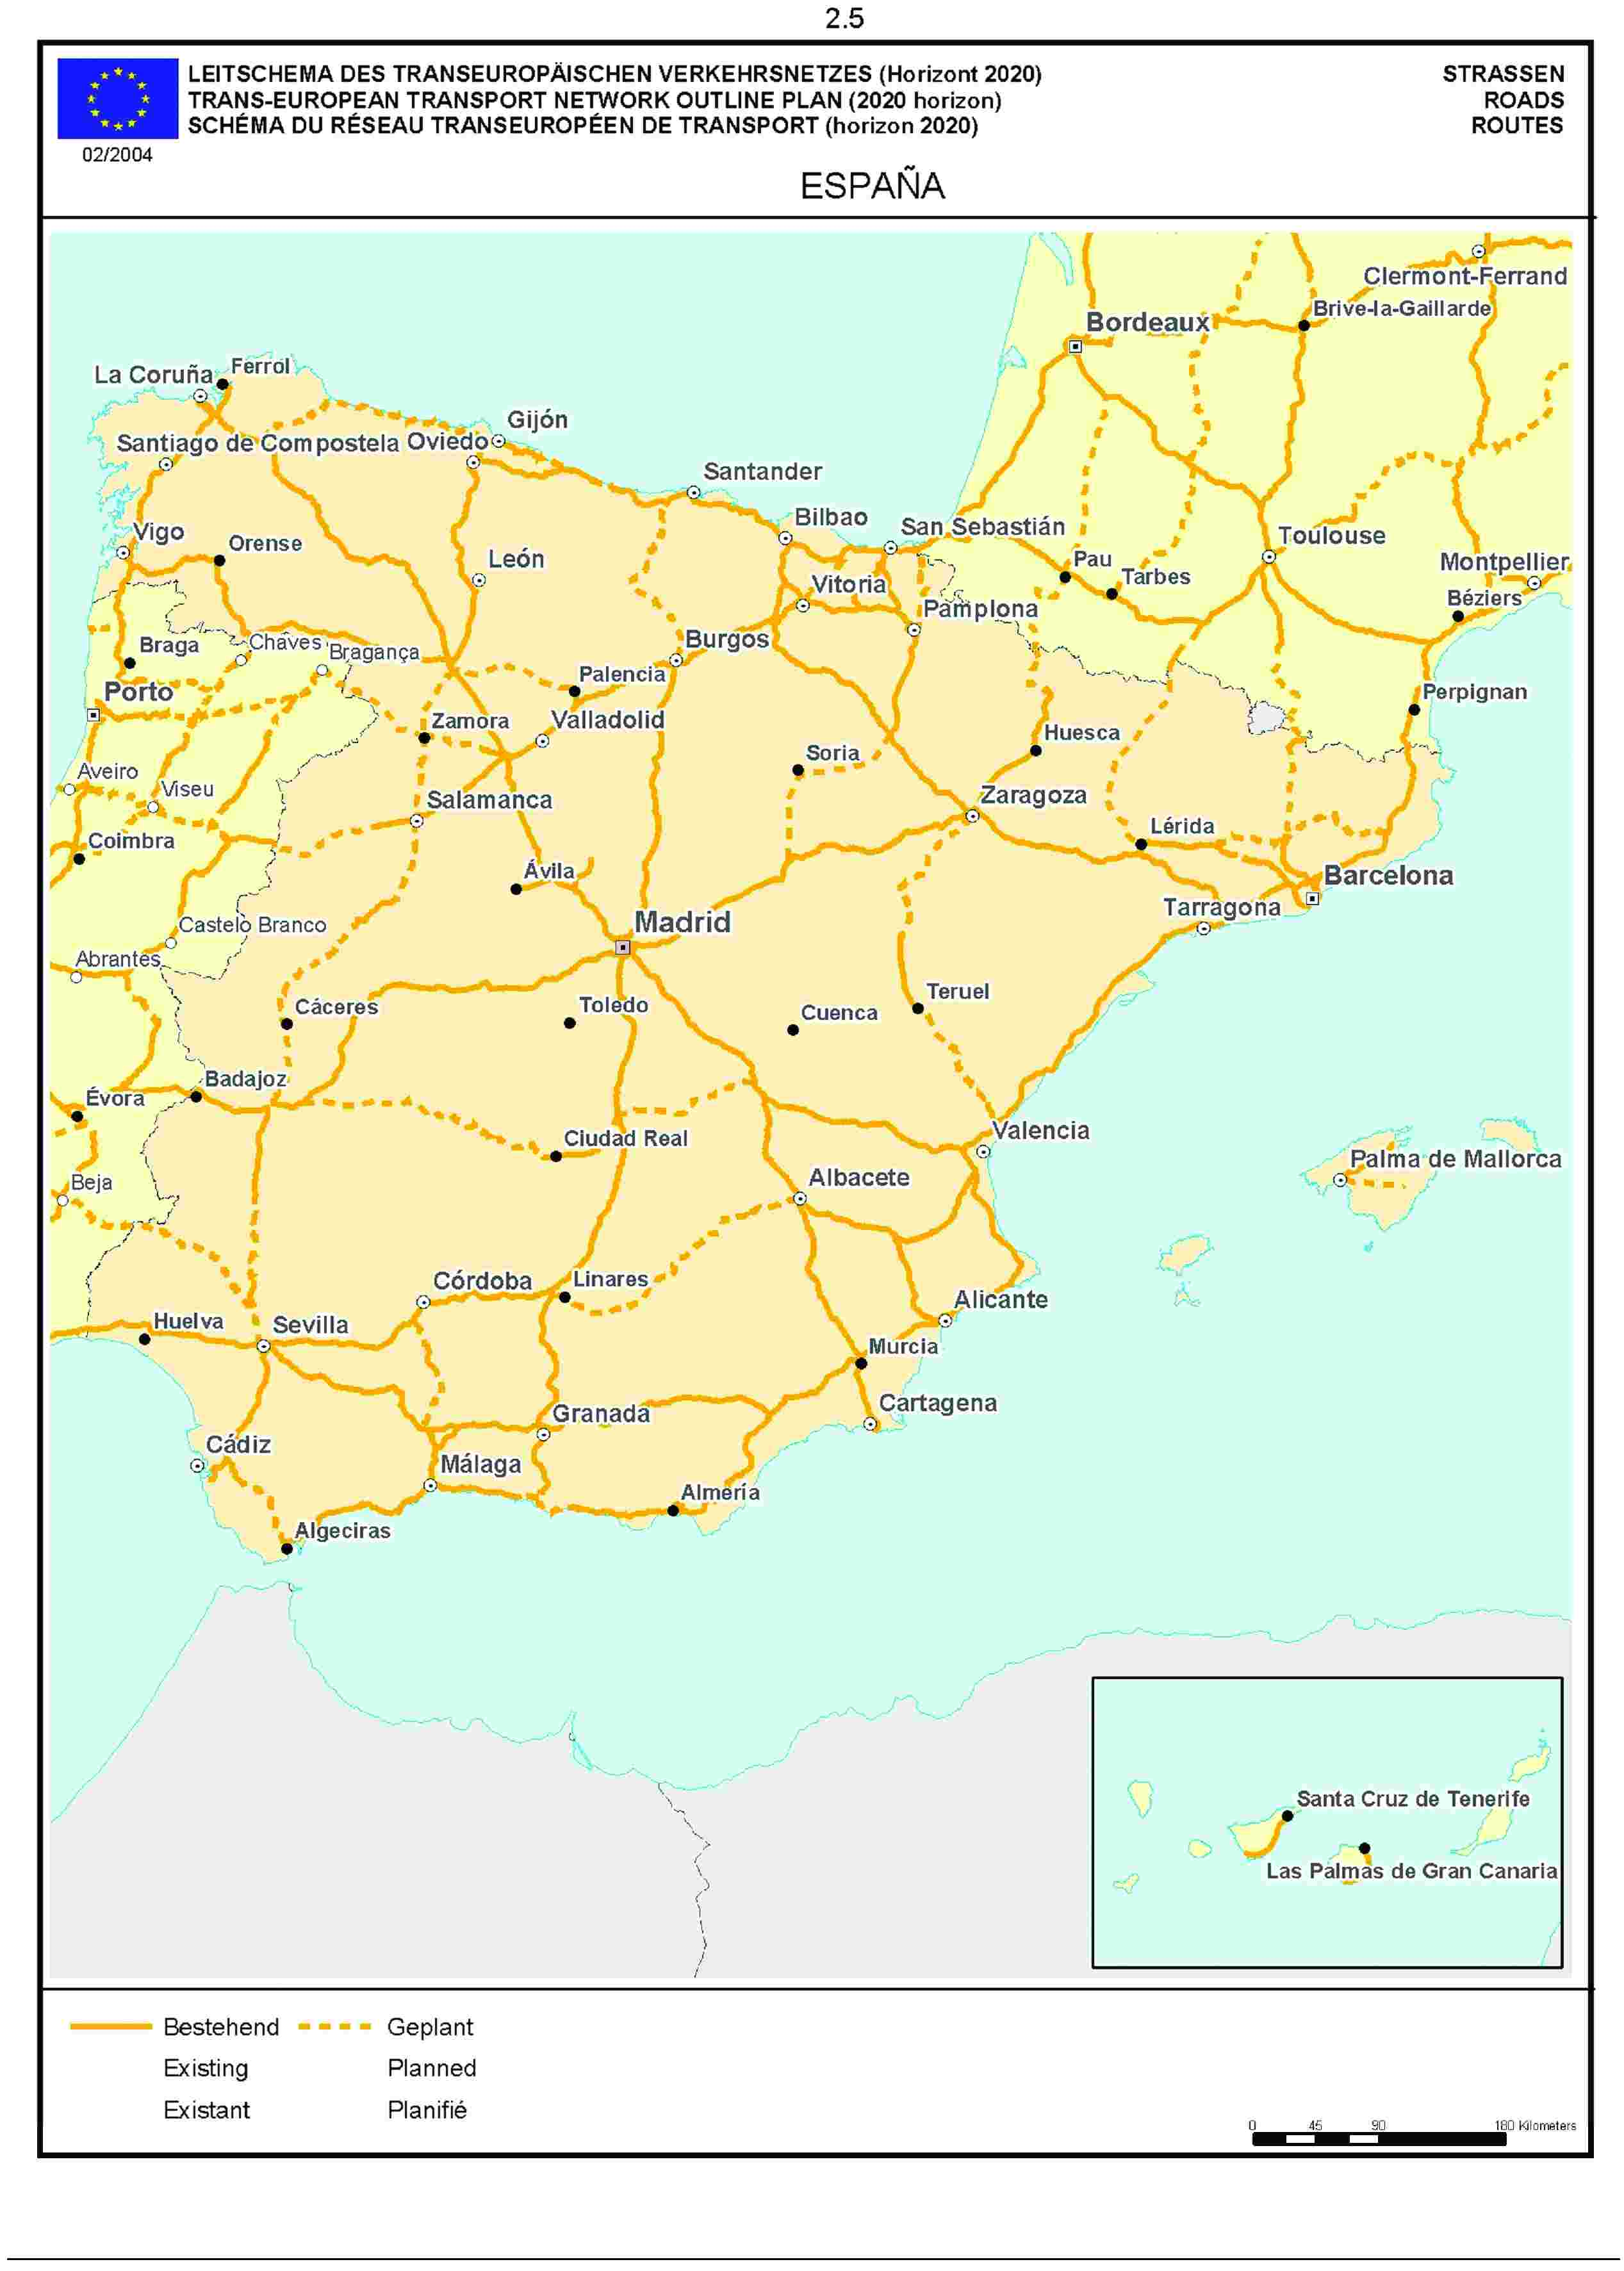 2.5LEITSCHEMA DES TRANSEUROPÄISCHEN VERKEHRSNETZES (Horizont 2020) STRASSENTRANS-EUROPEAN TRANSPORT NETWORK OUTLINE PLAN (2020 horizon) ROADSSCHÉMA DU RÉSEAU TRANSEUROPÉEN DE TRANSPORT (horizon 2020) ROUTE02/2004ESPAÑA